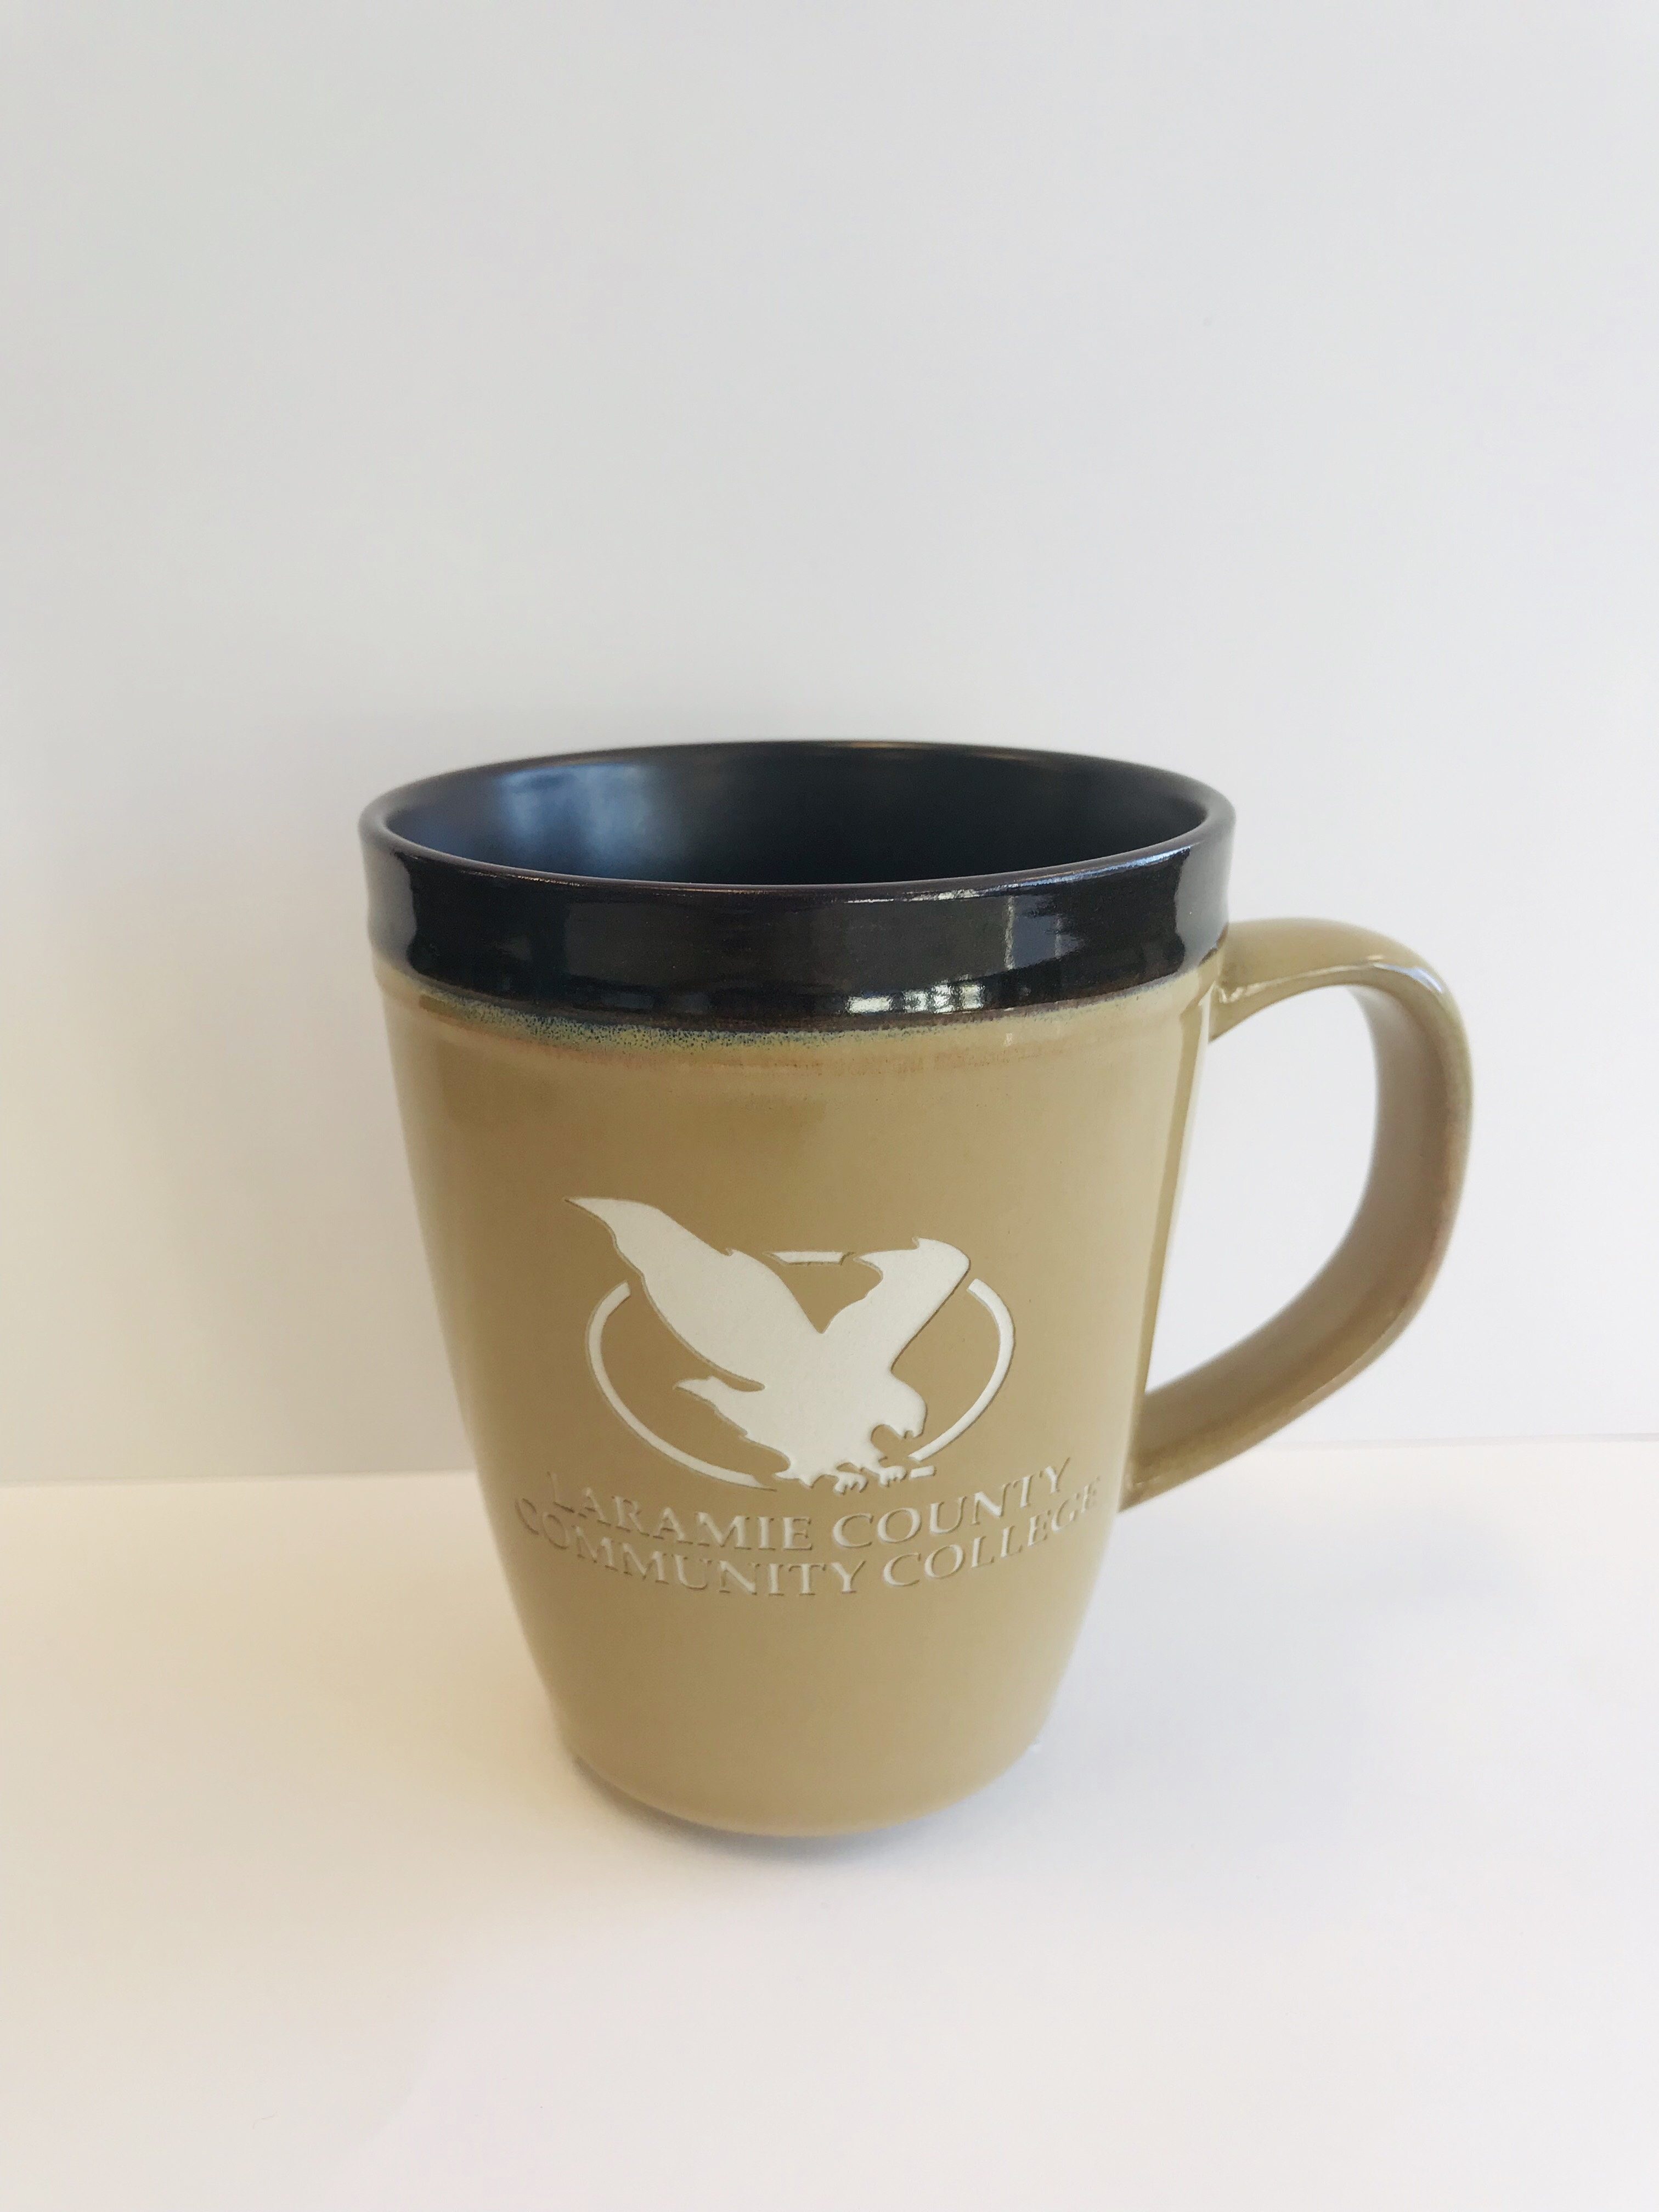 LCCC Glazed Mug